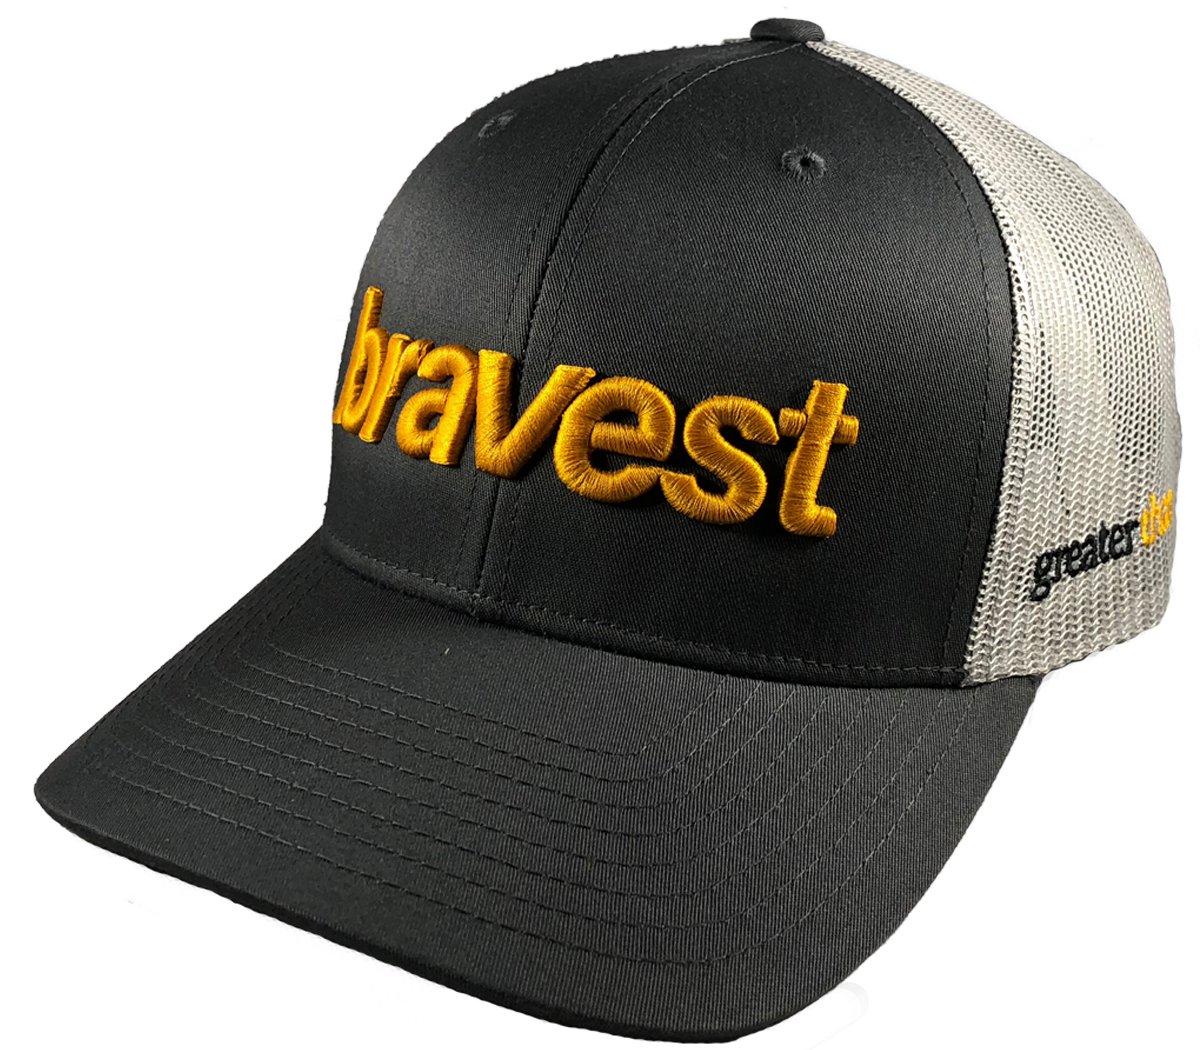 BRAVEST hat